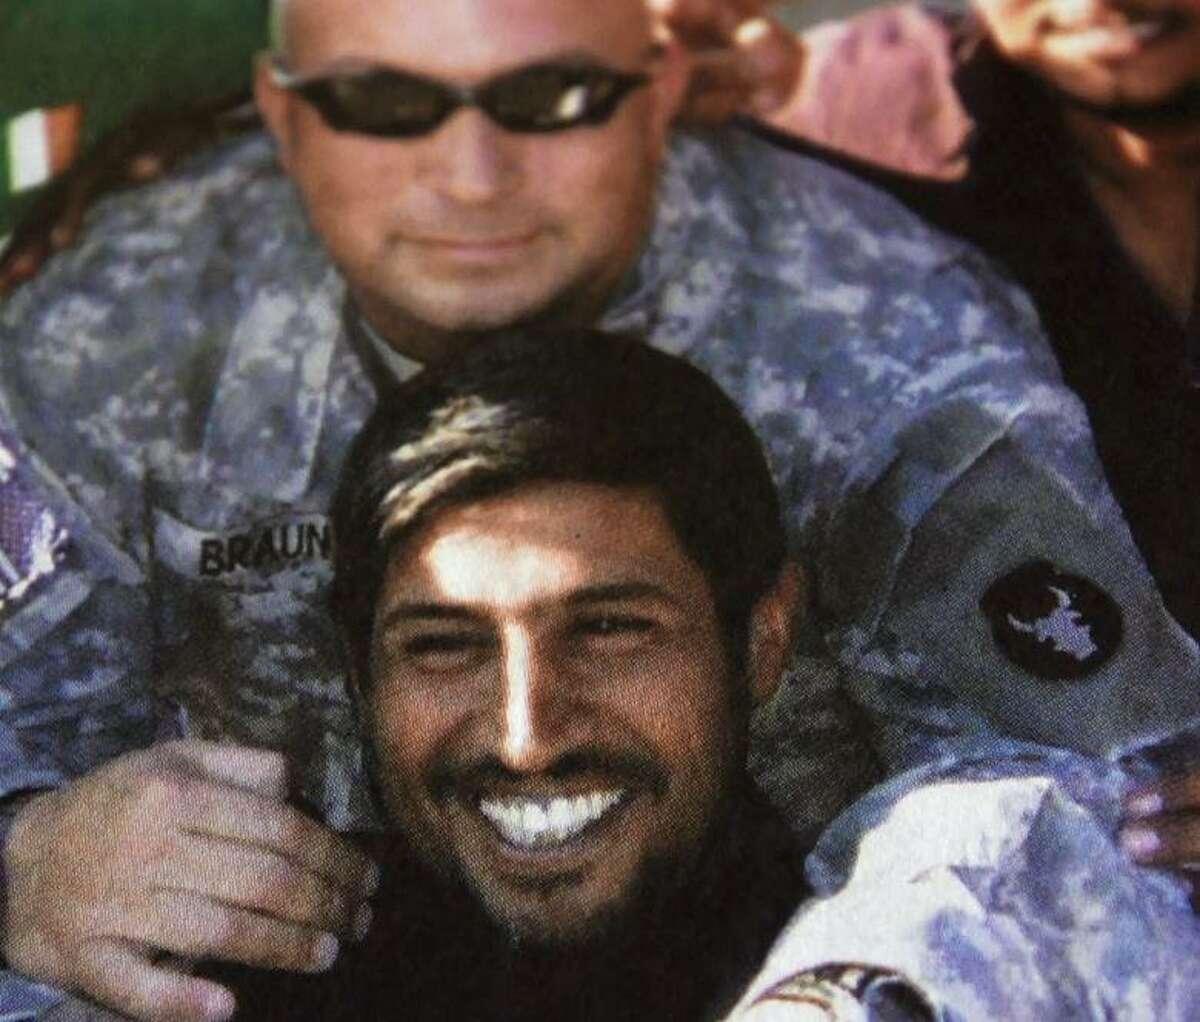 U.S. Army Staff Sgt. Paul Braun worked to help one of his Iraqi interpreters -